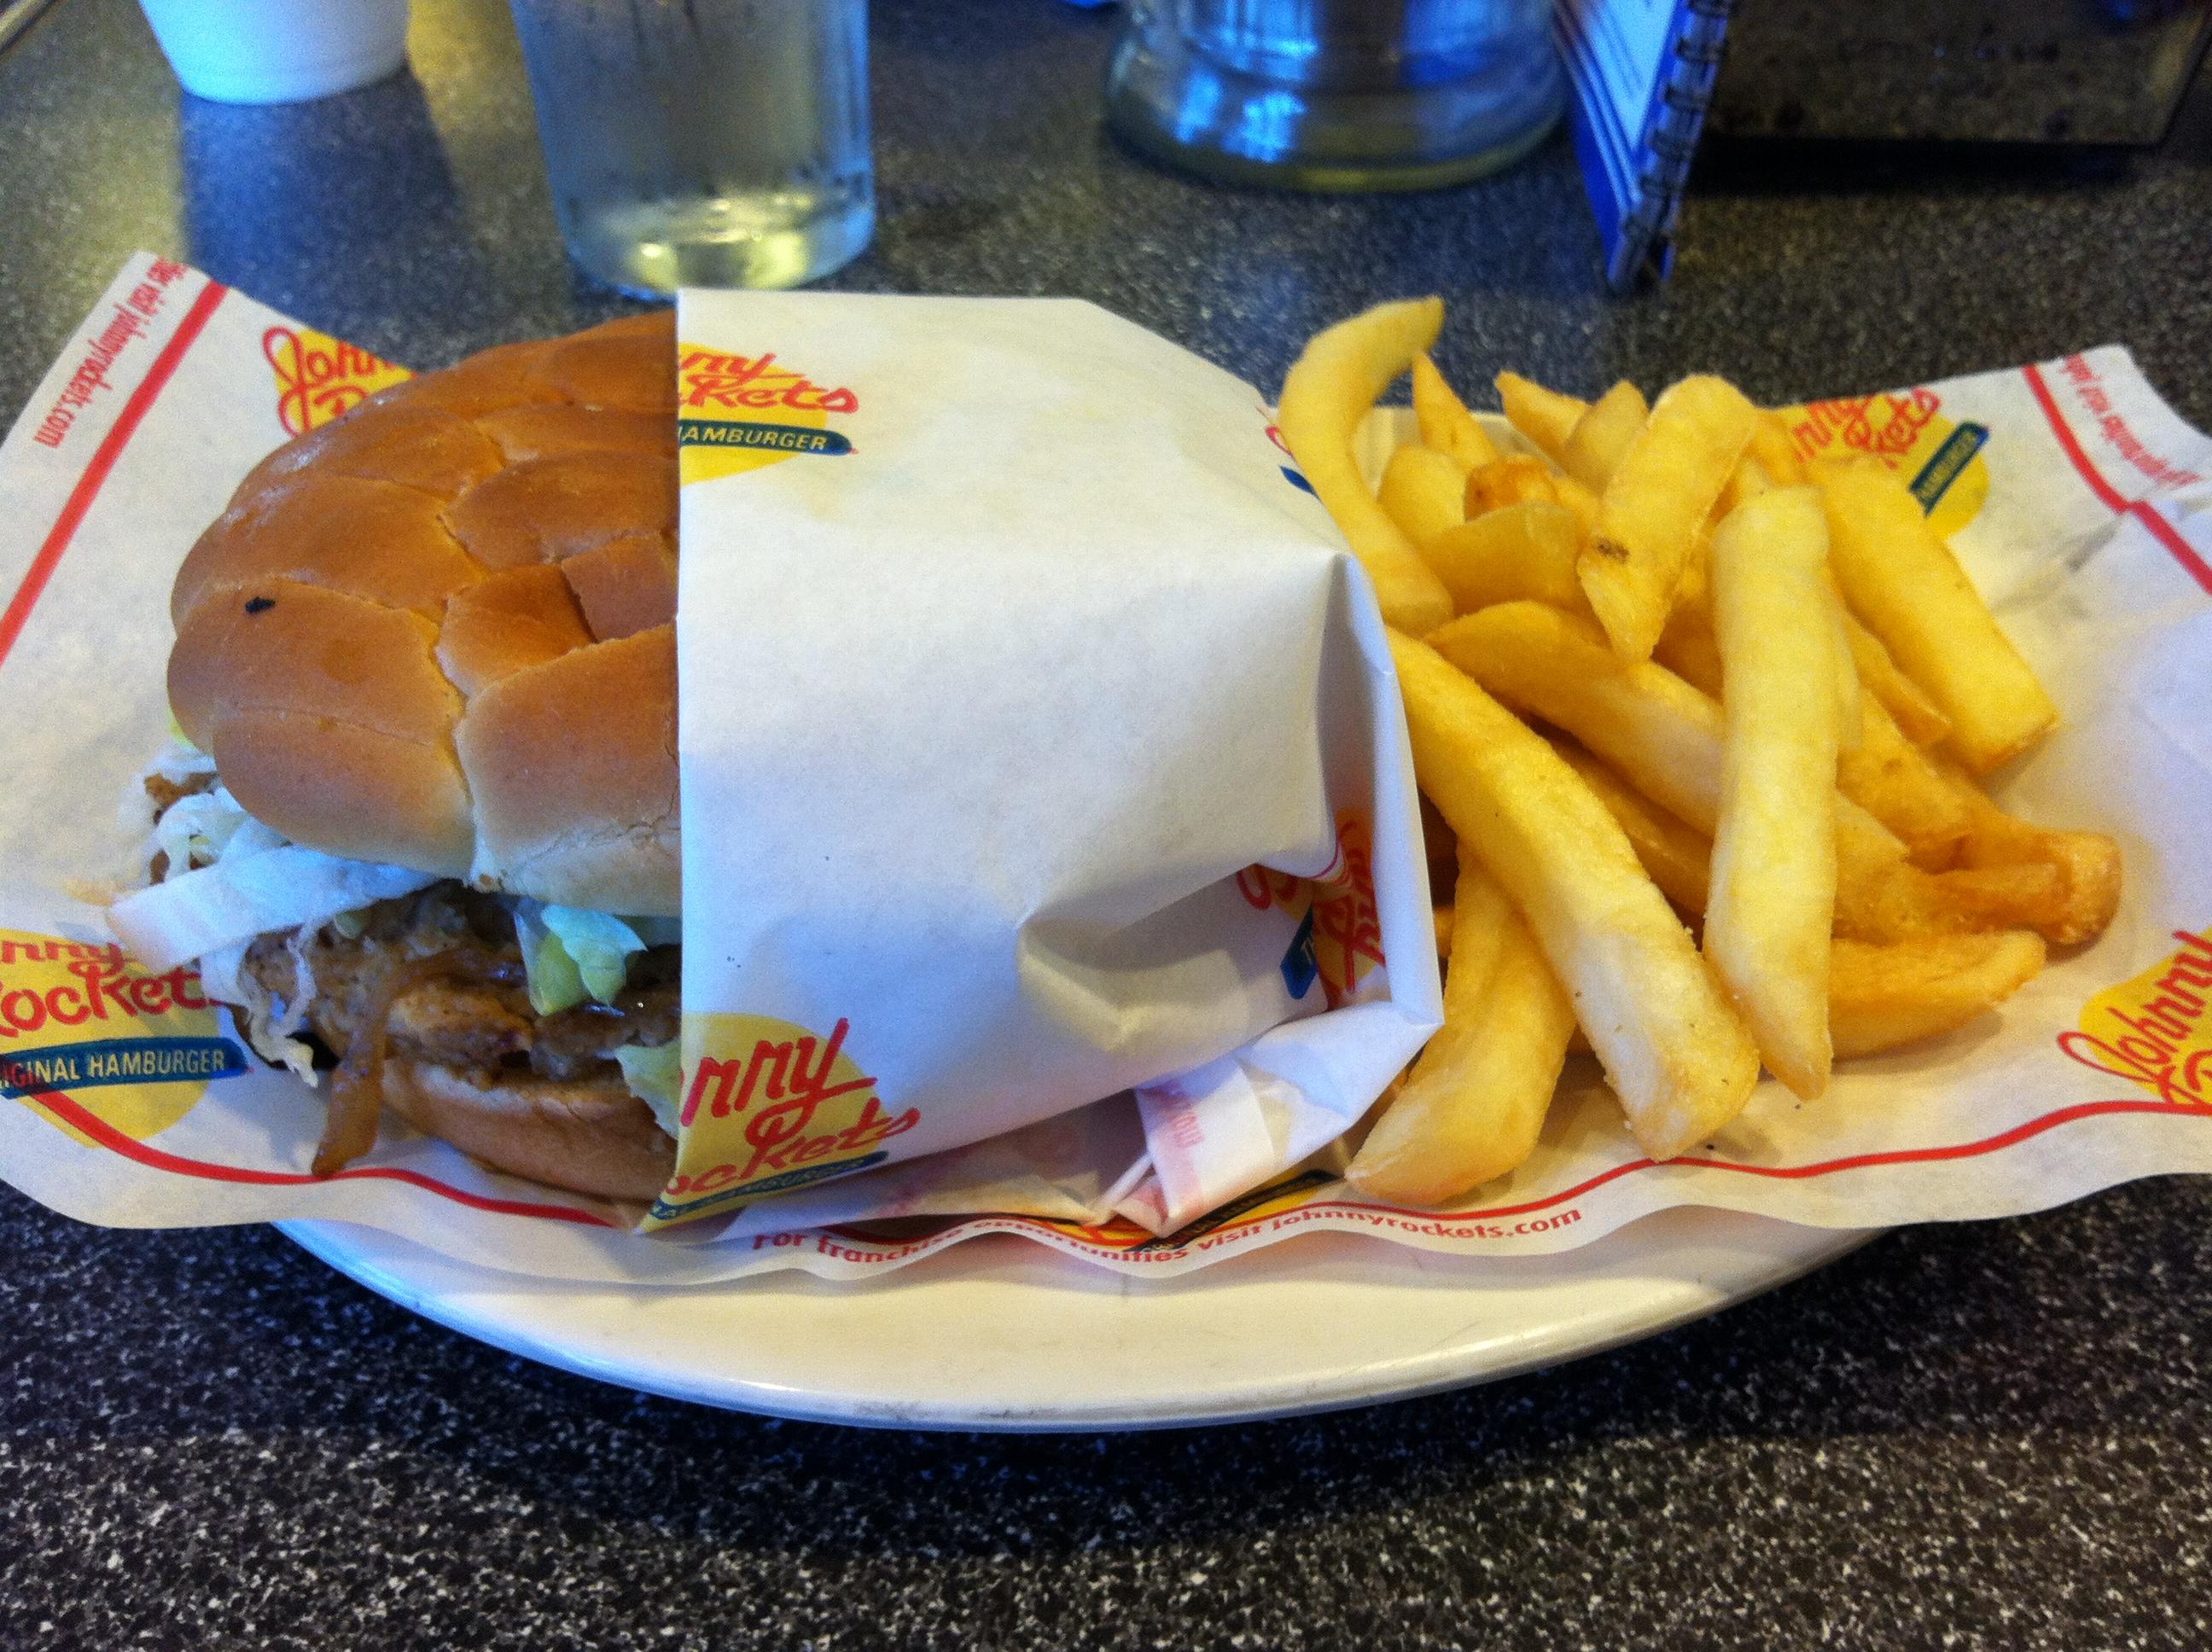 johnny rockets veggie burger review the streamliner vegan burger